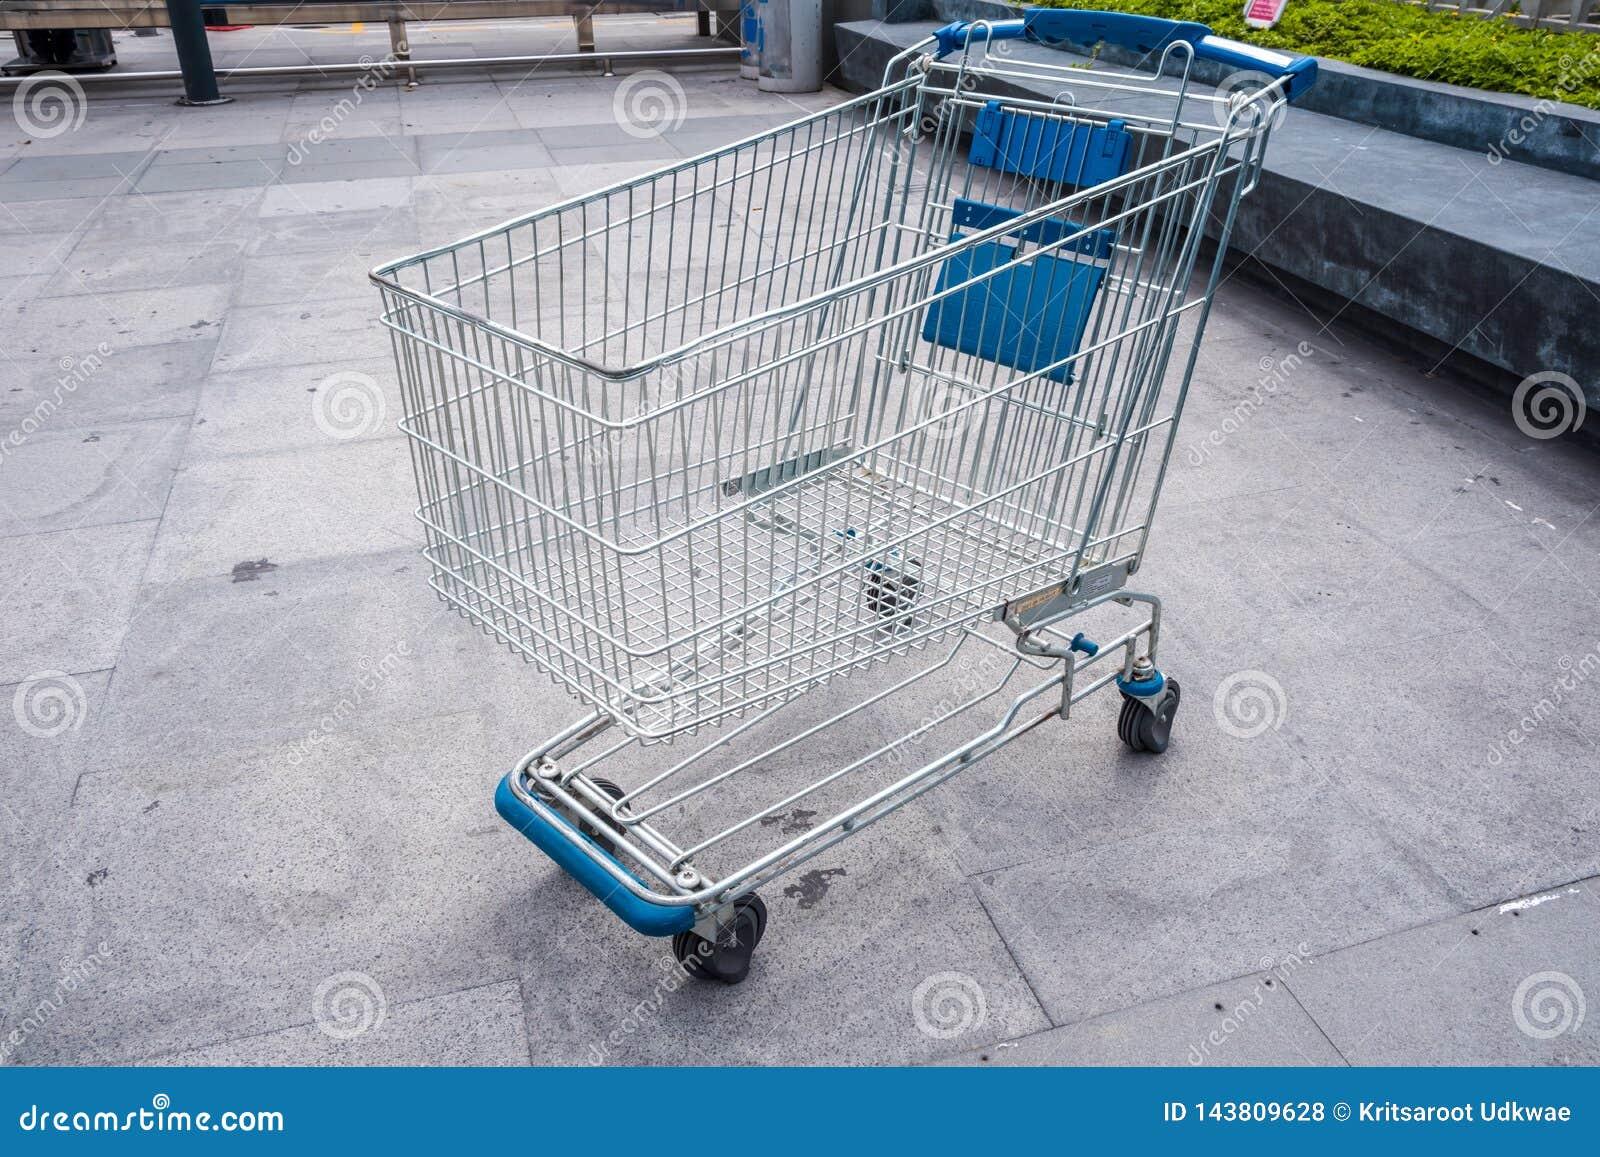 Shopping cart at supermarket area.